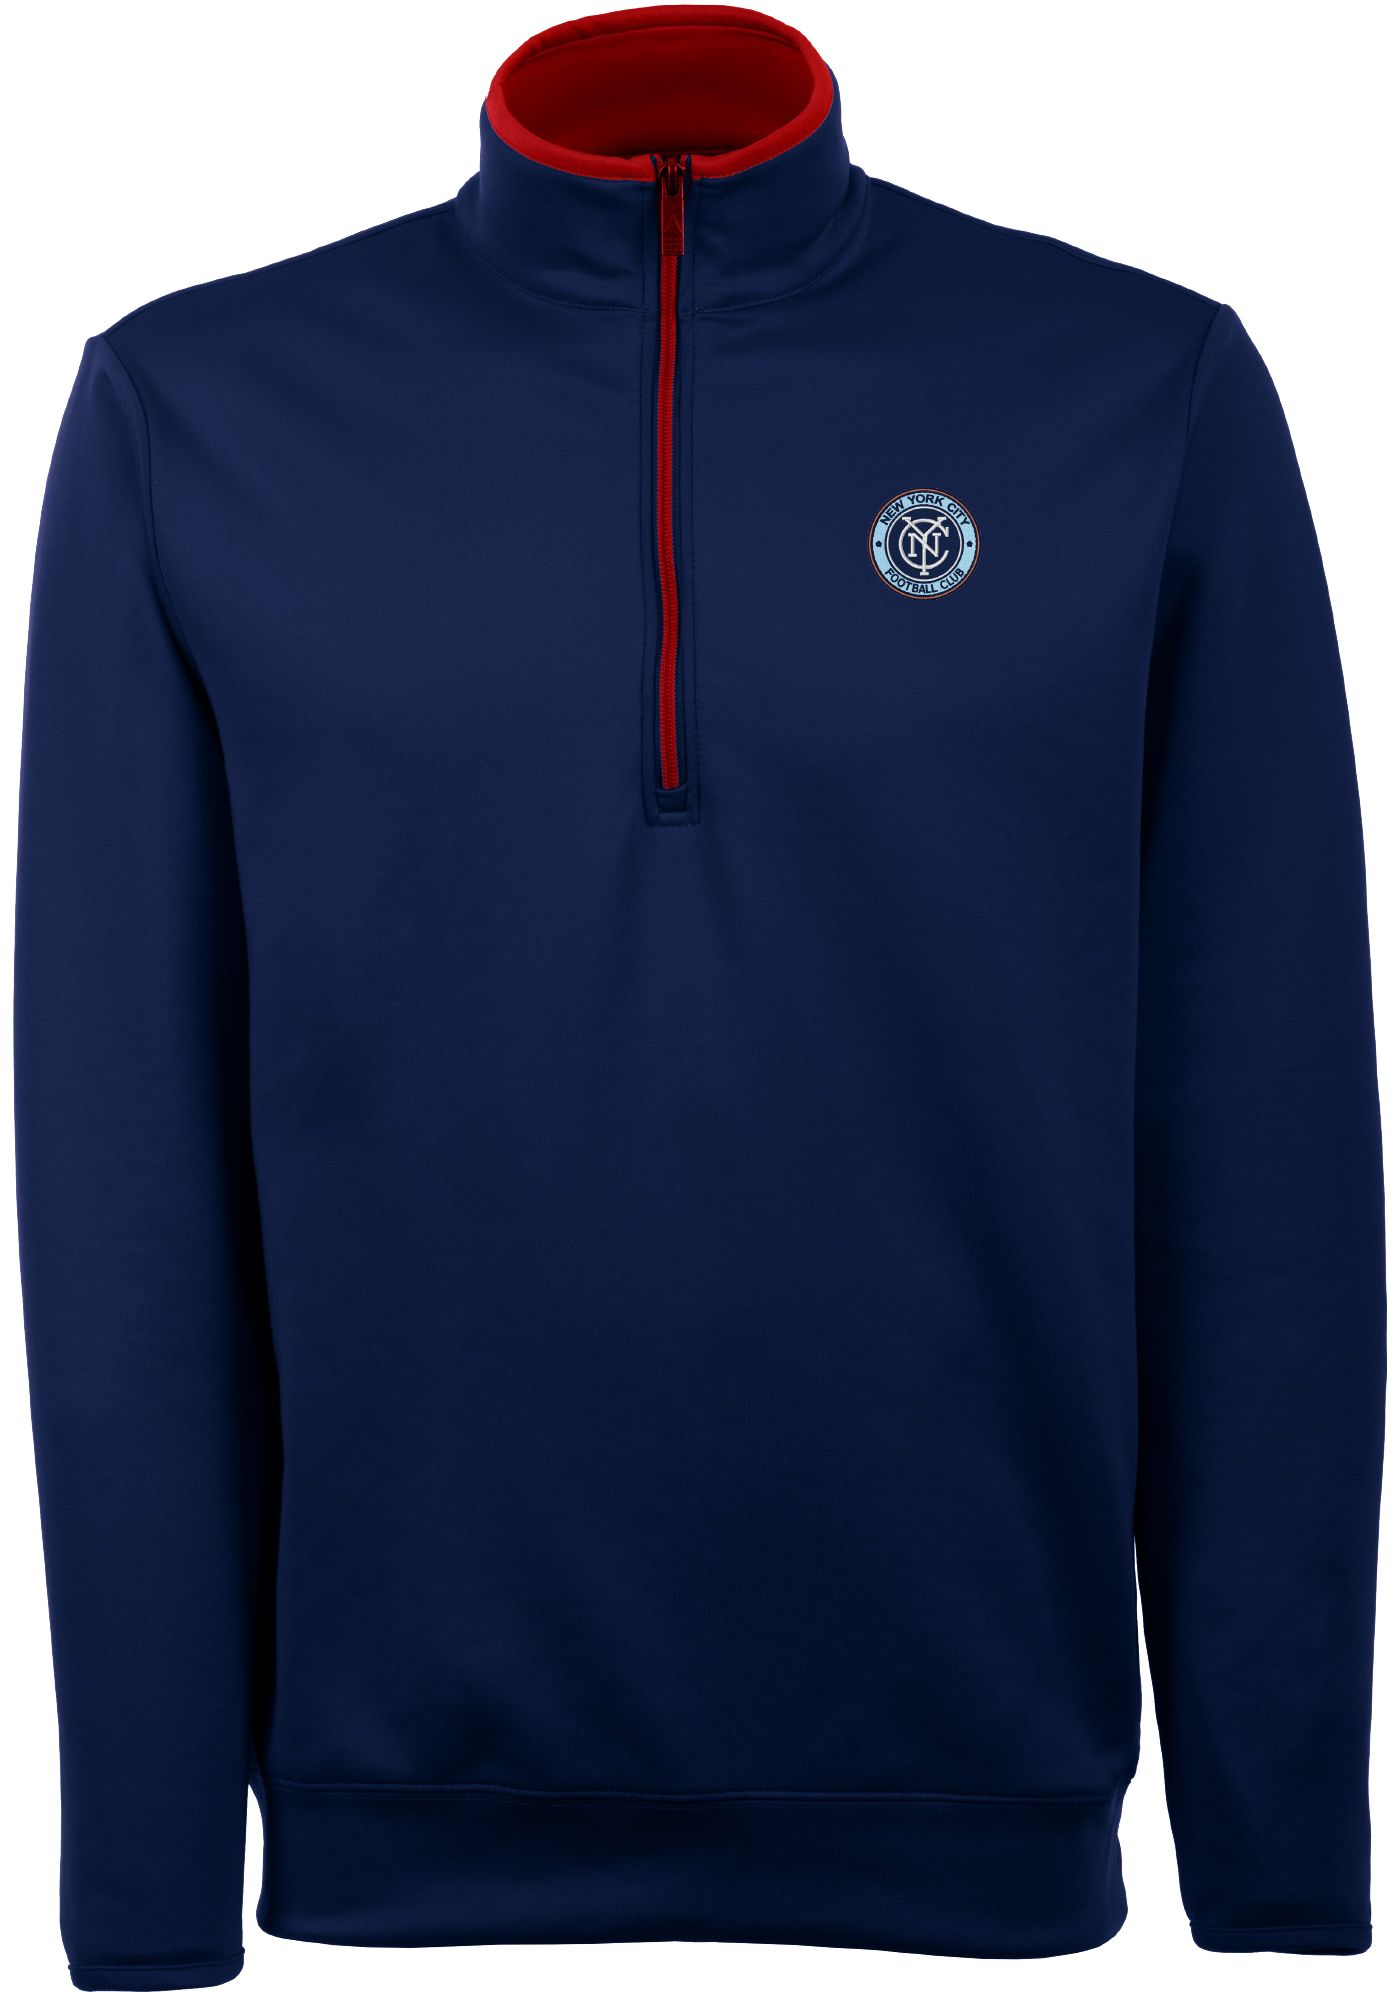 Antigua Men's New York City FC Leader Navy Quarter-Zip Jacket